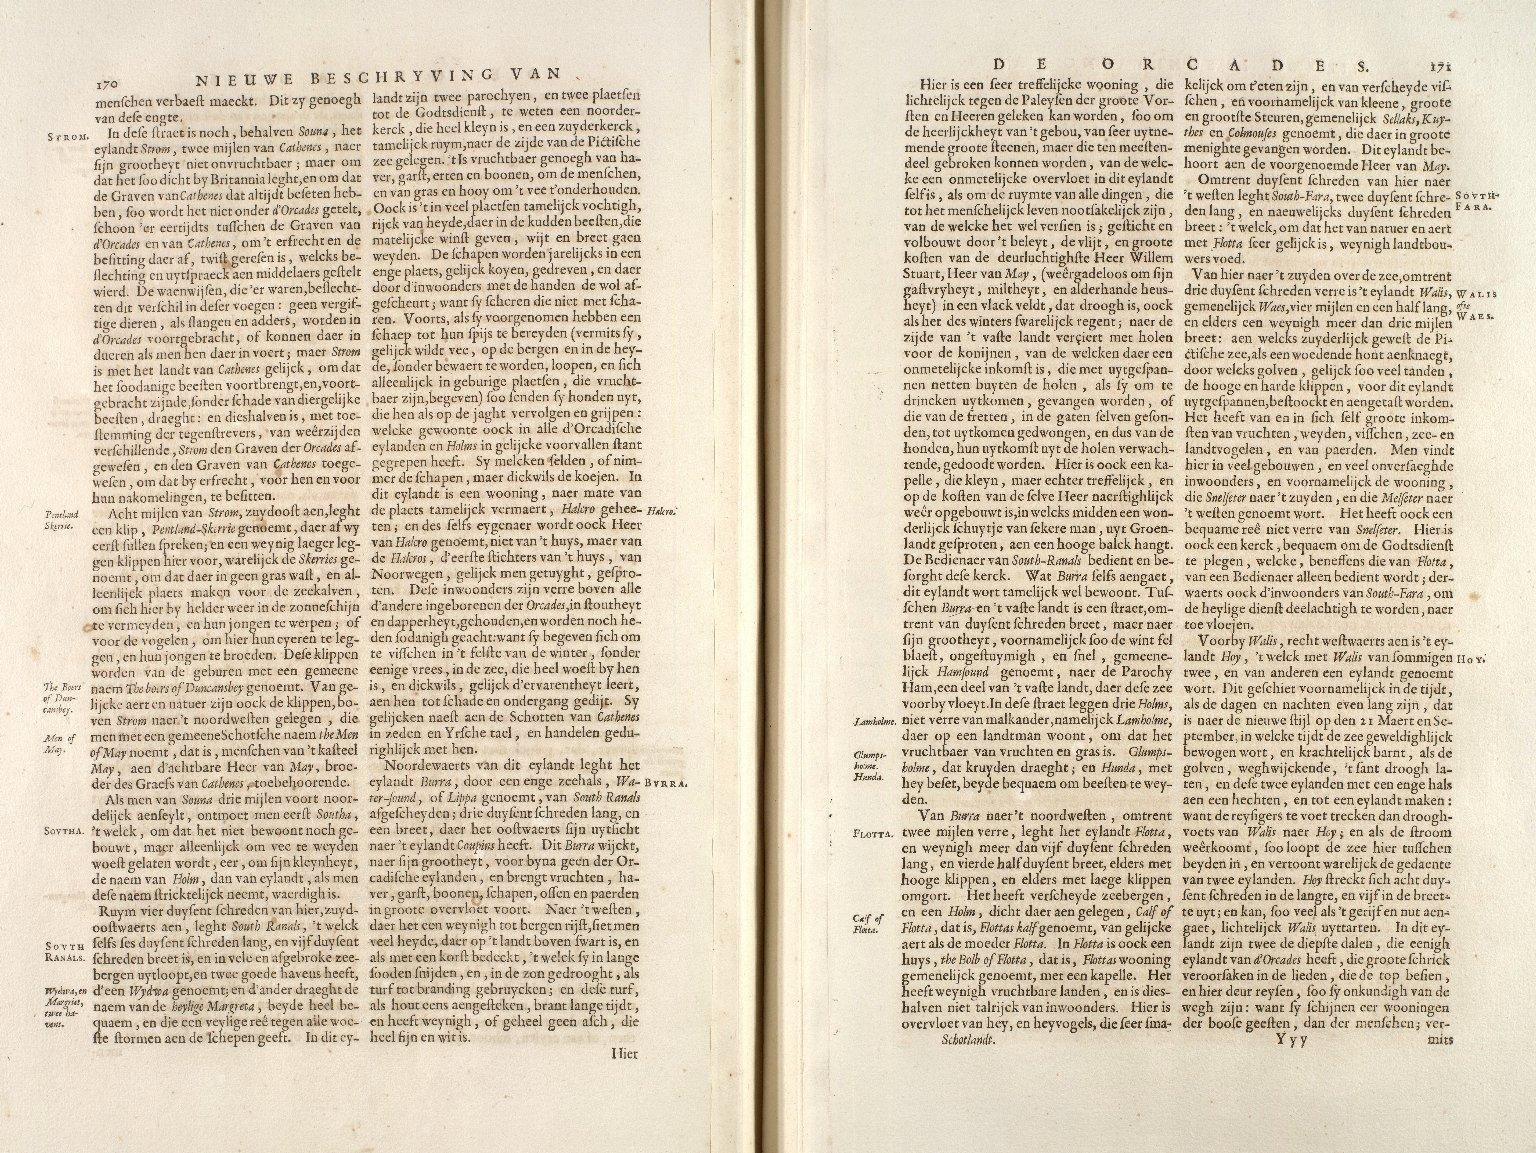 [Geographiae Blavianae] [Also known as: Atlas major] [143 of 153]